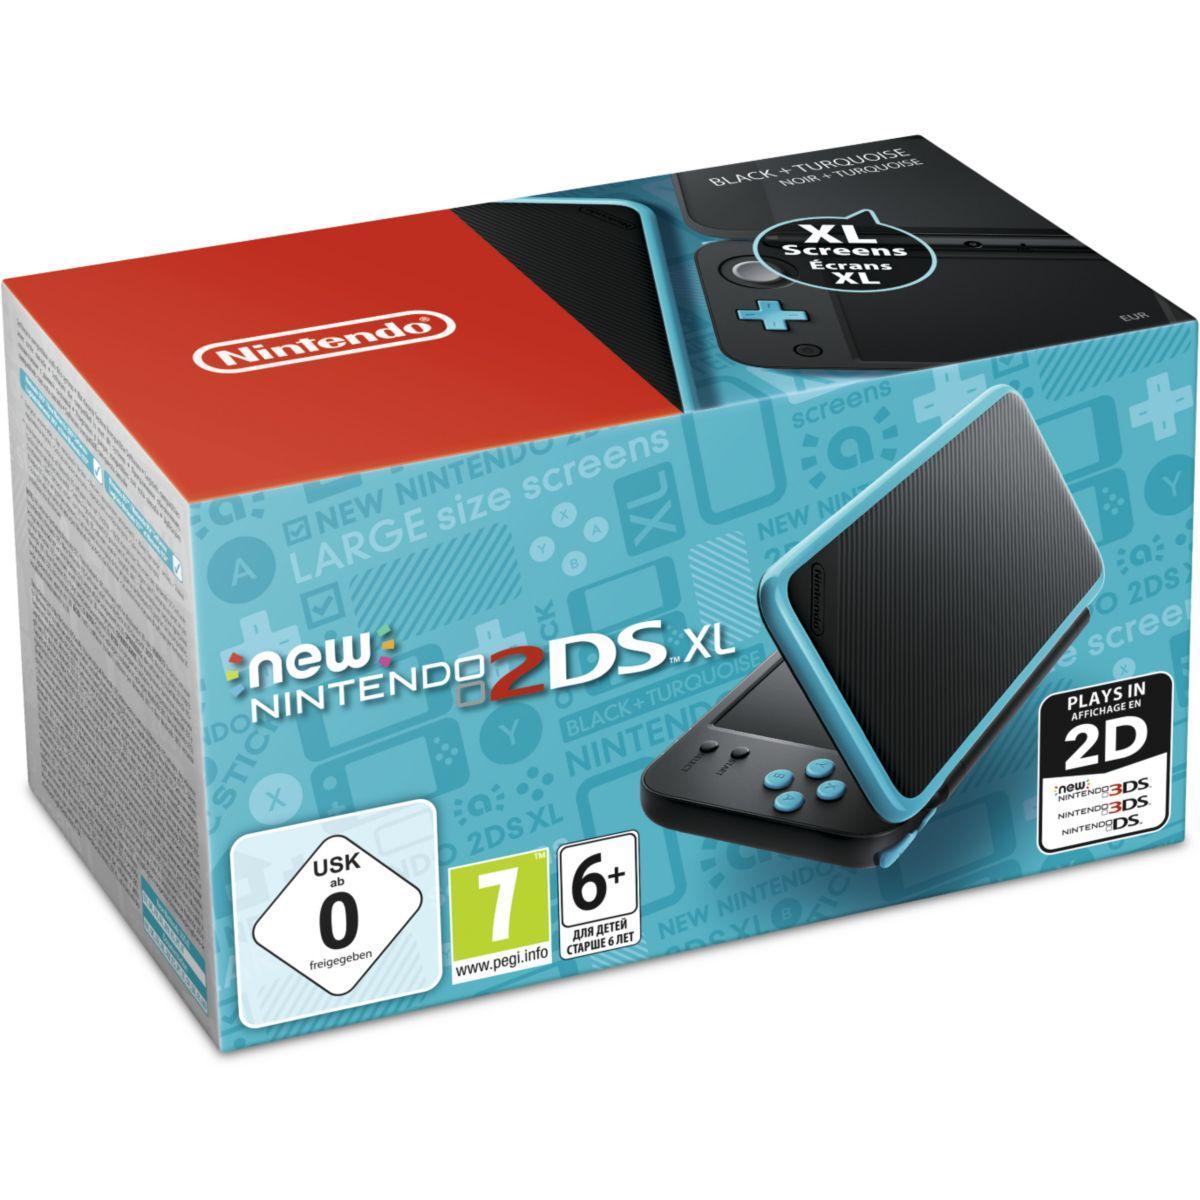 Console new 2ds xl nintendo new 2ds xl noire / turquoise (photo)